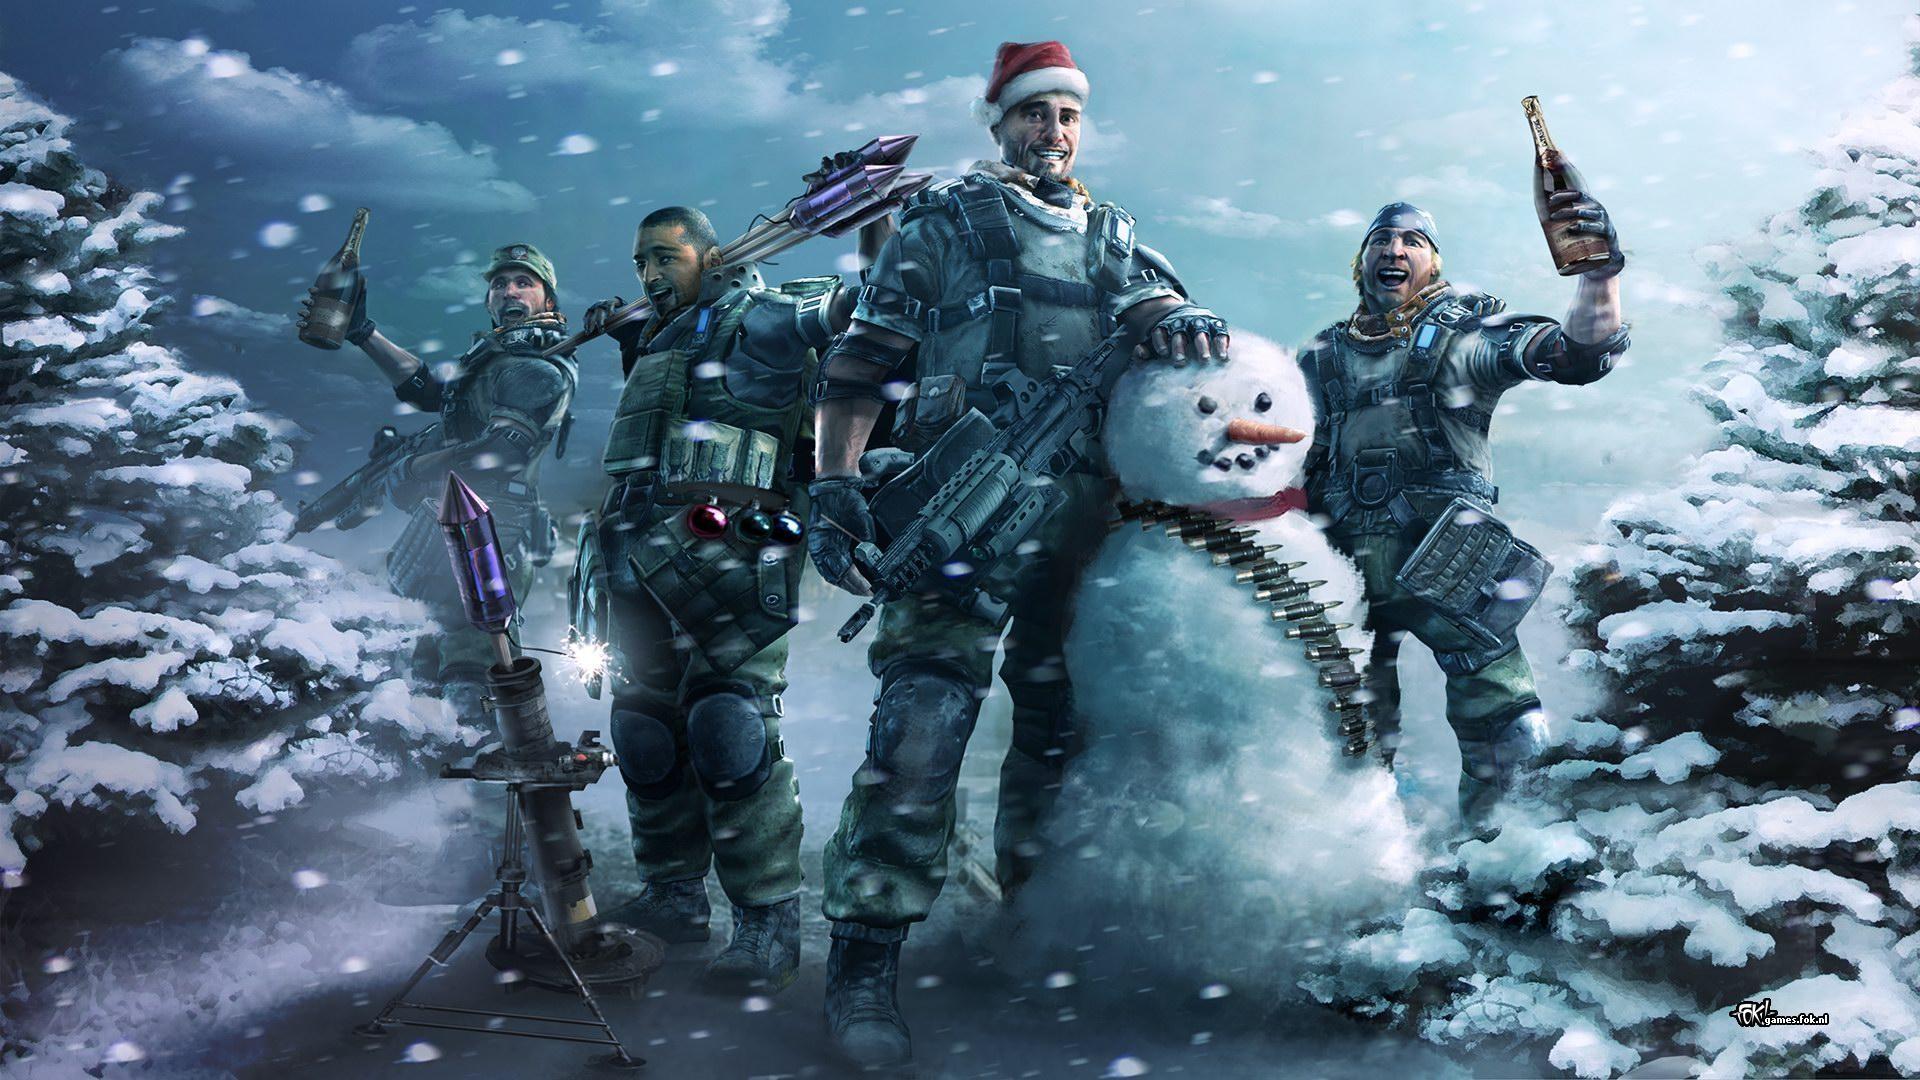 Holiday – Christmas Wallpaper